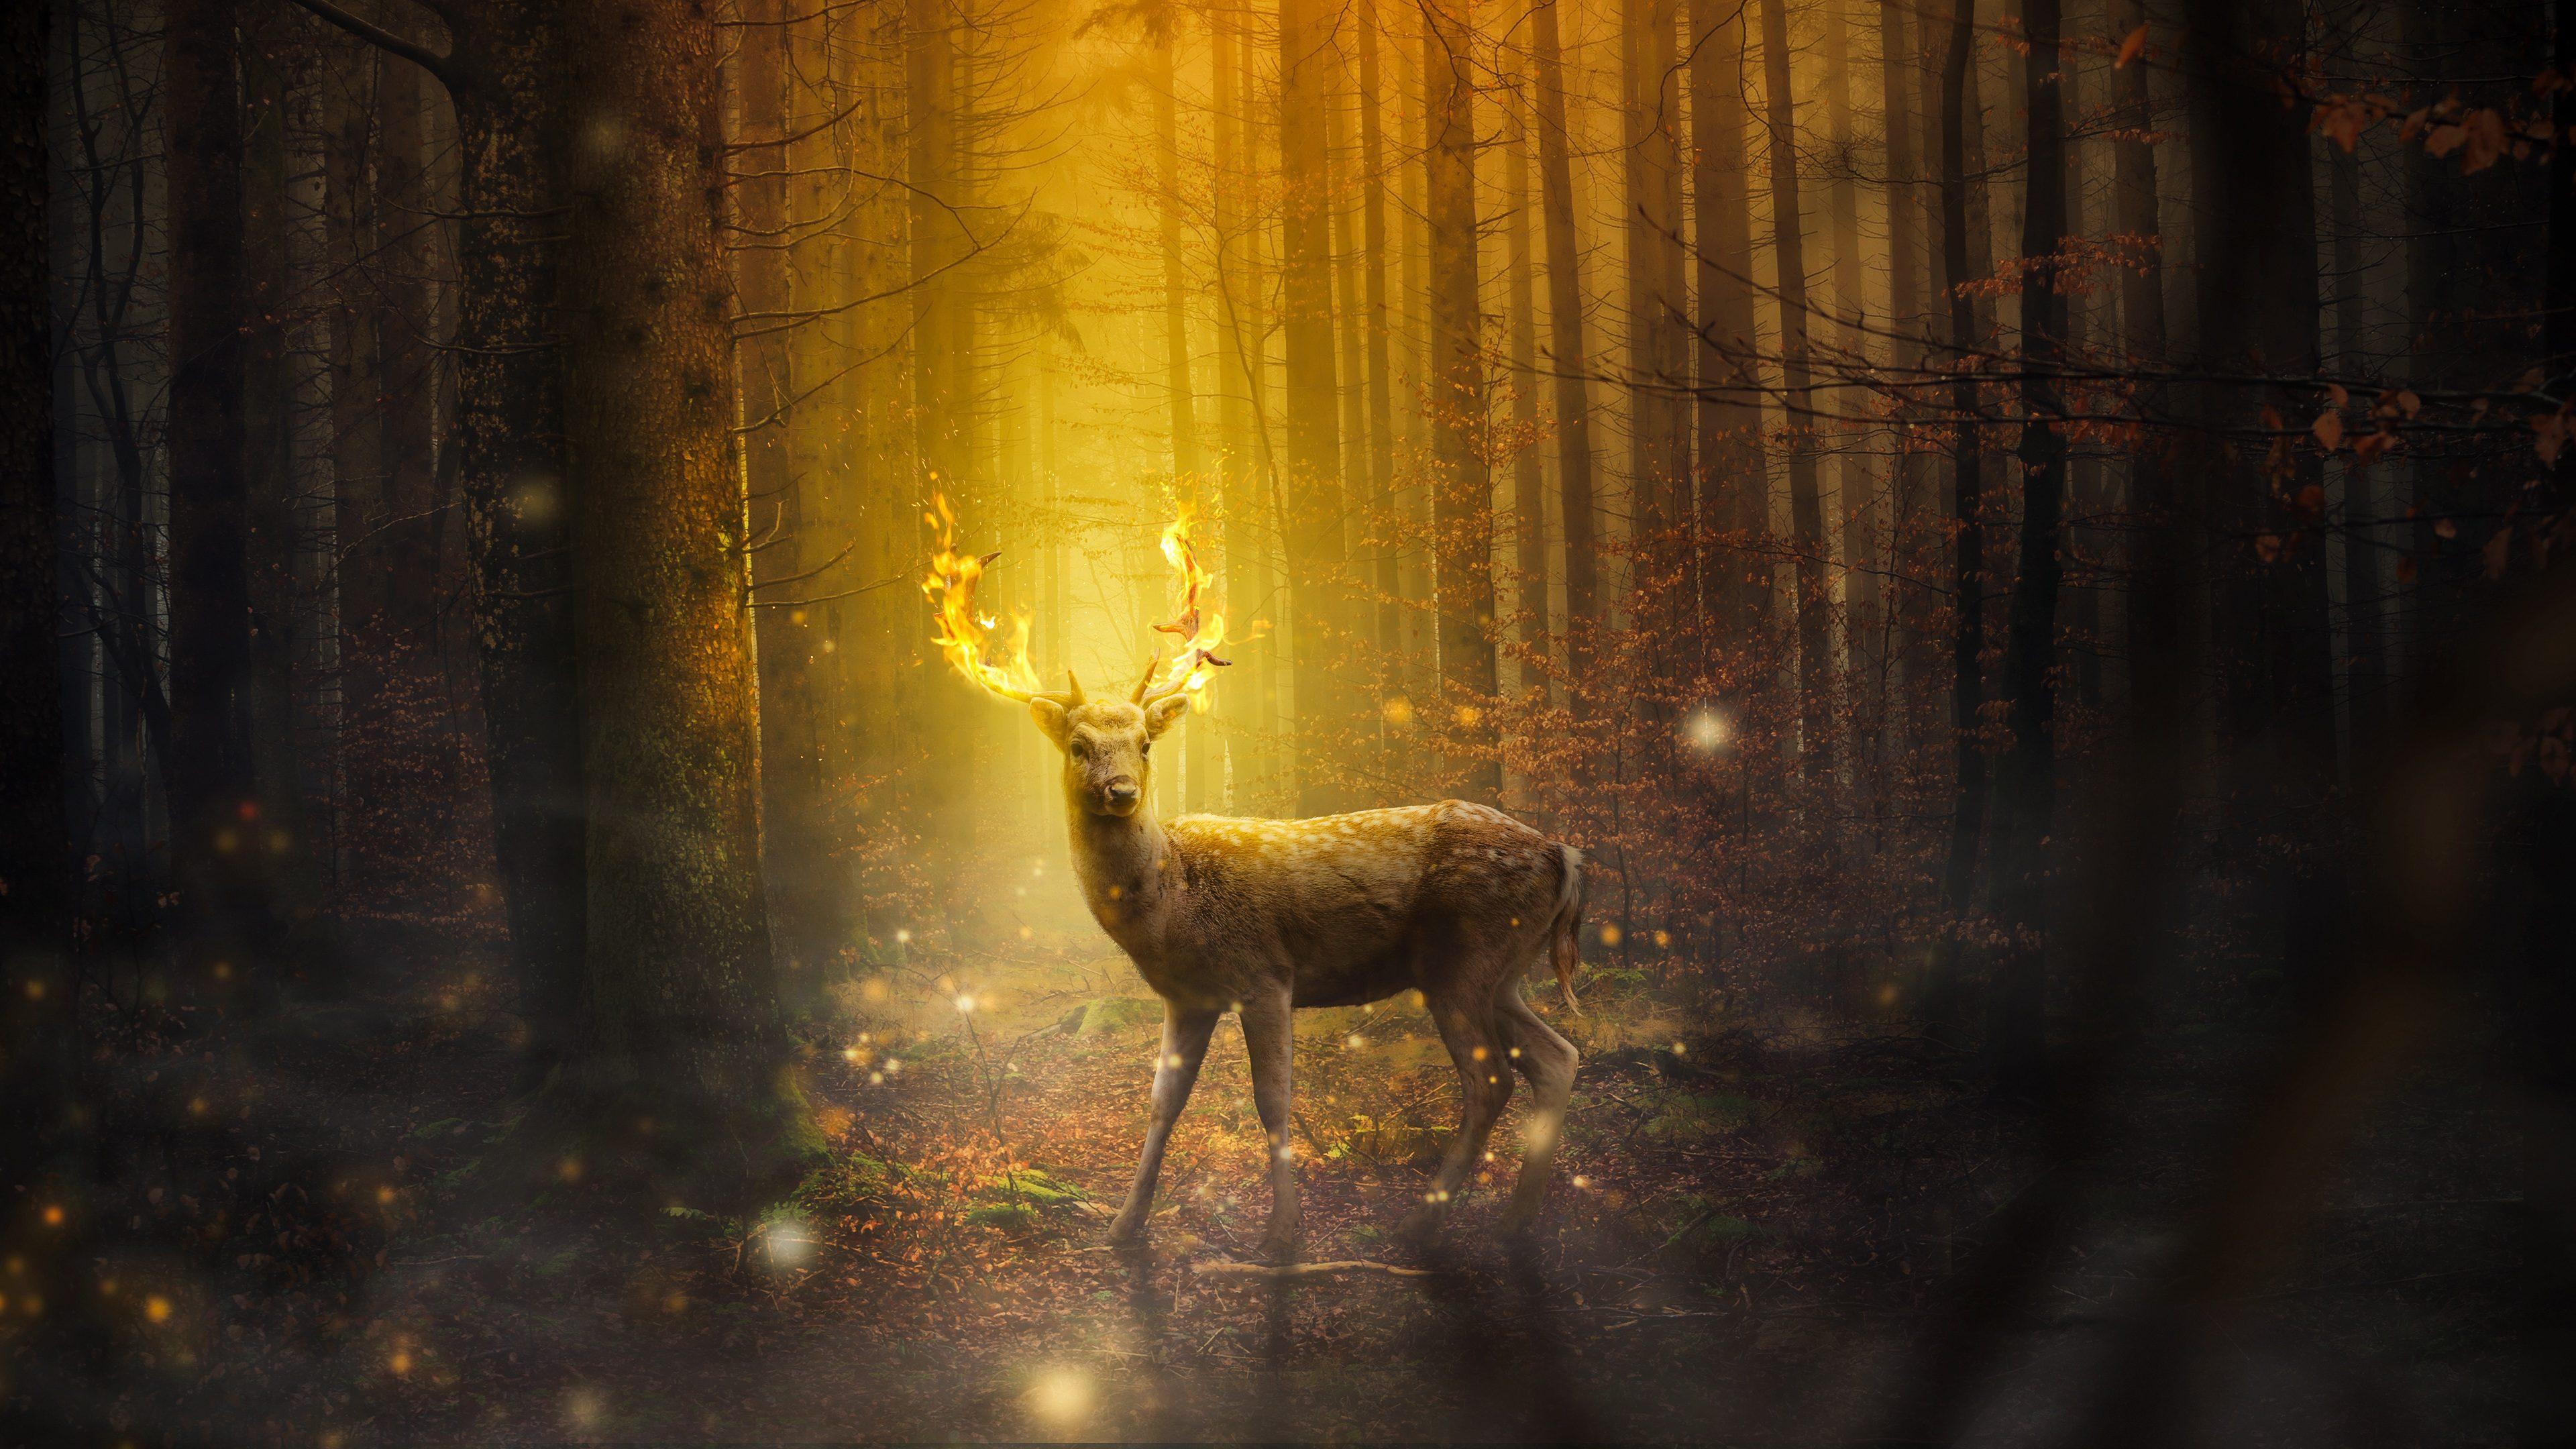 Fantasy Deer Fire 4K Wallpaper - Best Wallpapers